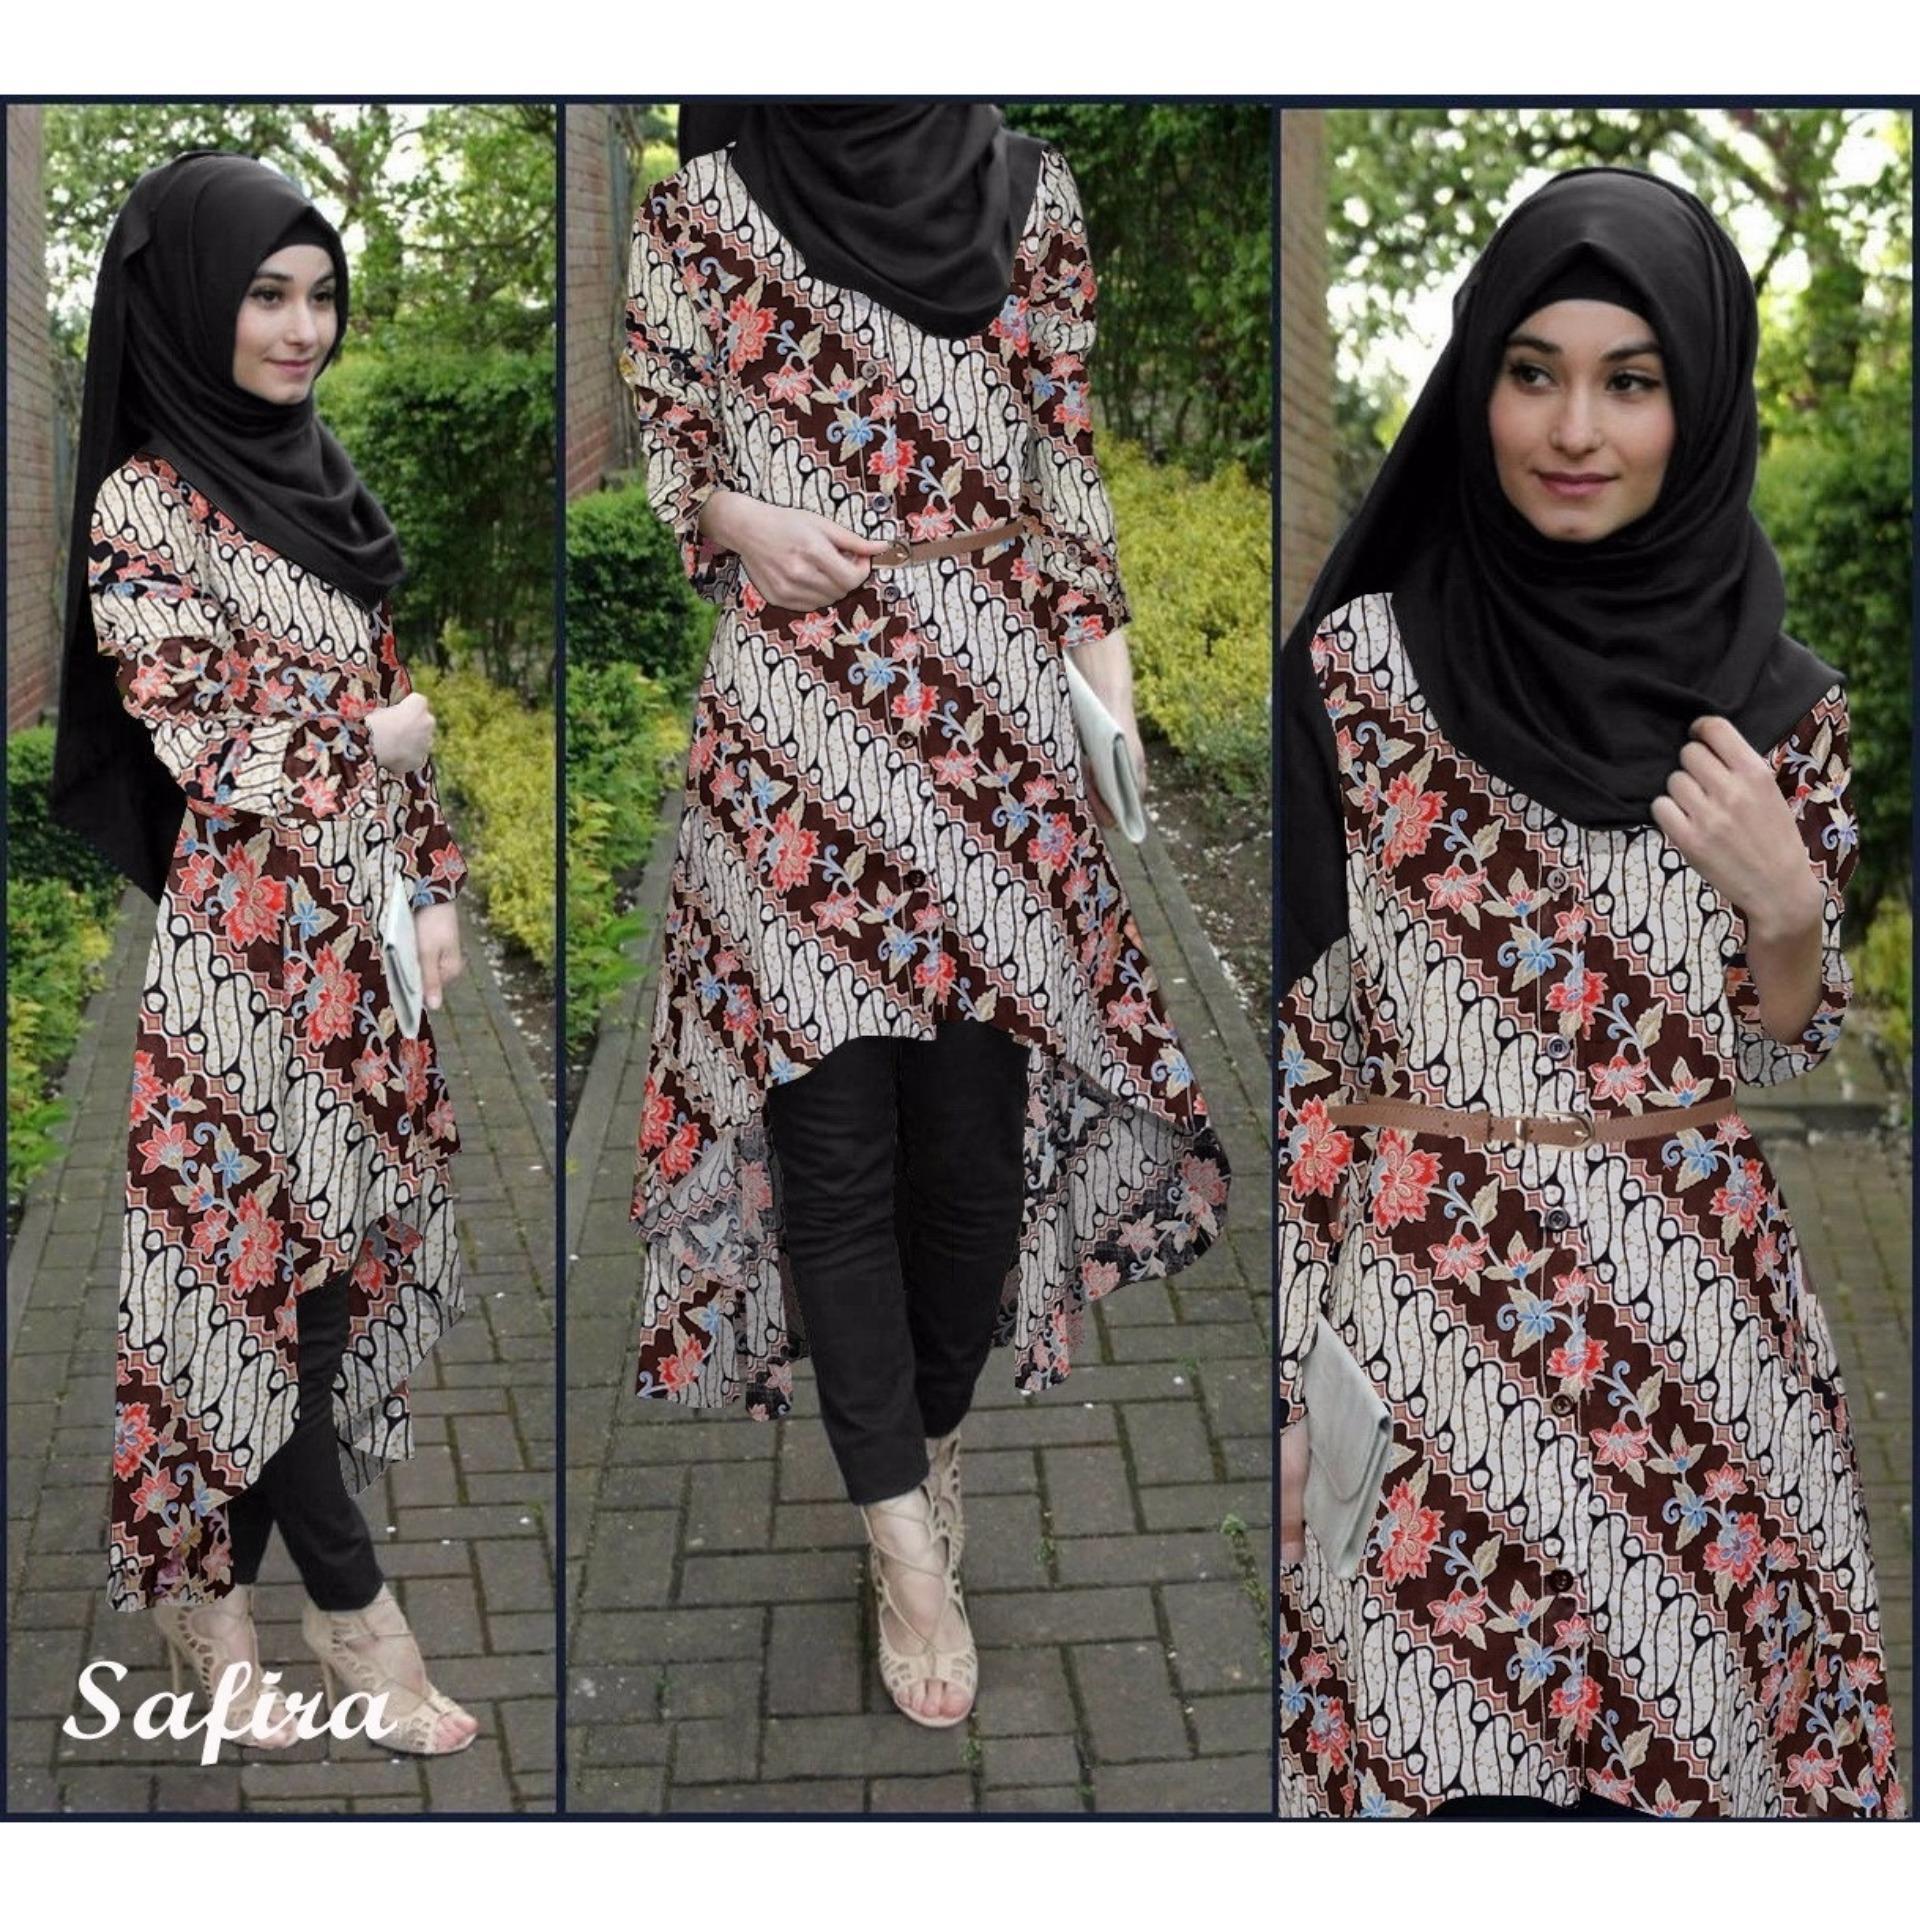 Hemat Ladies Fashion Batik Wanita Couple Resa Kemeja Cowok Pria Baju Muslim Cewek Hijaber Gamis Maxy Maxi Long Veana Dress Limited Flavia Store Set 4 In 1 Fs0697 Coklat Setelan Muslimah